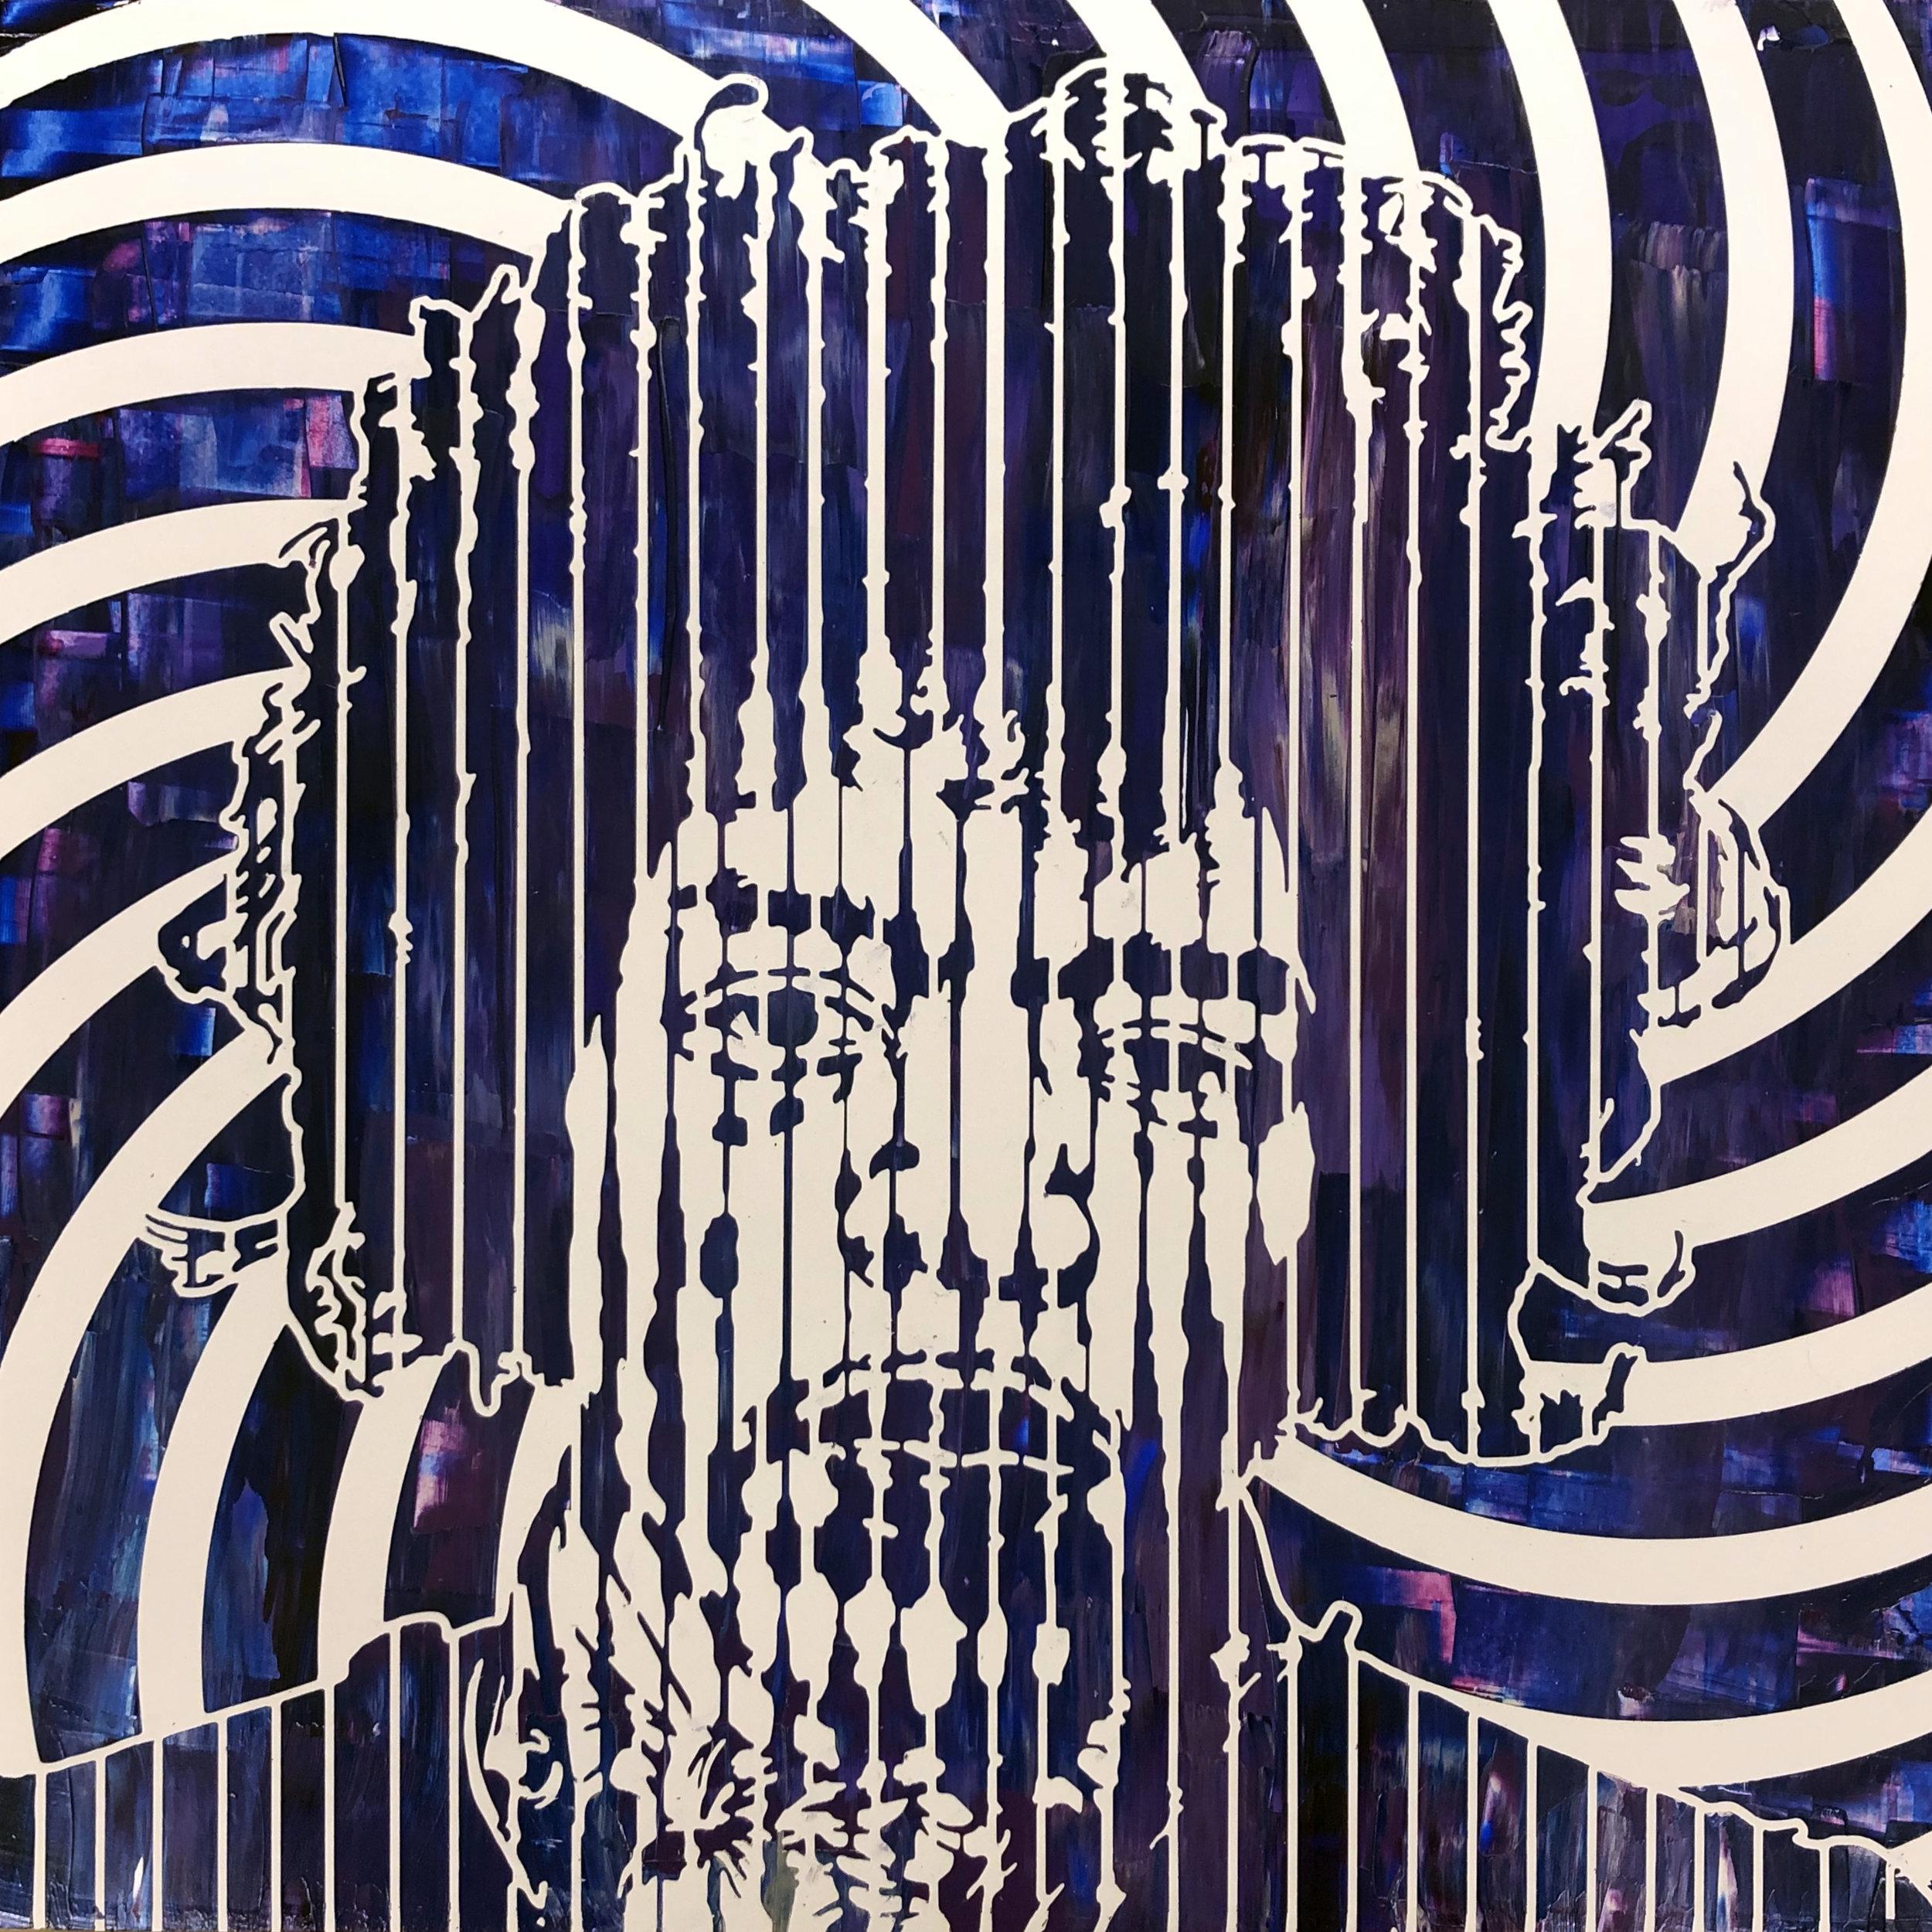 Sean Christopher Ward - Jimi V - Acrylic on Wood Panel - 16x16x1.5 - 2018 - 500.jpg